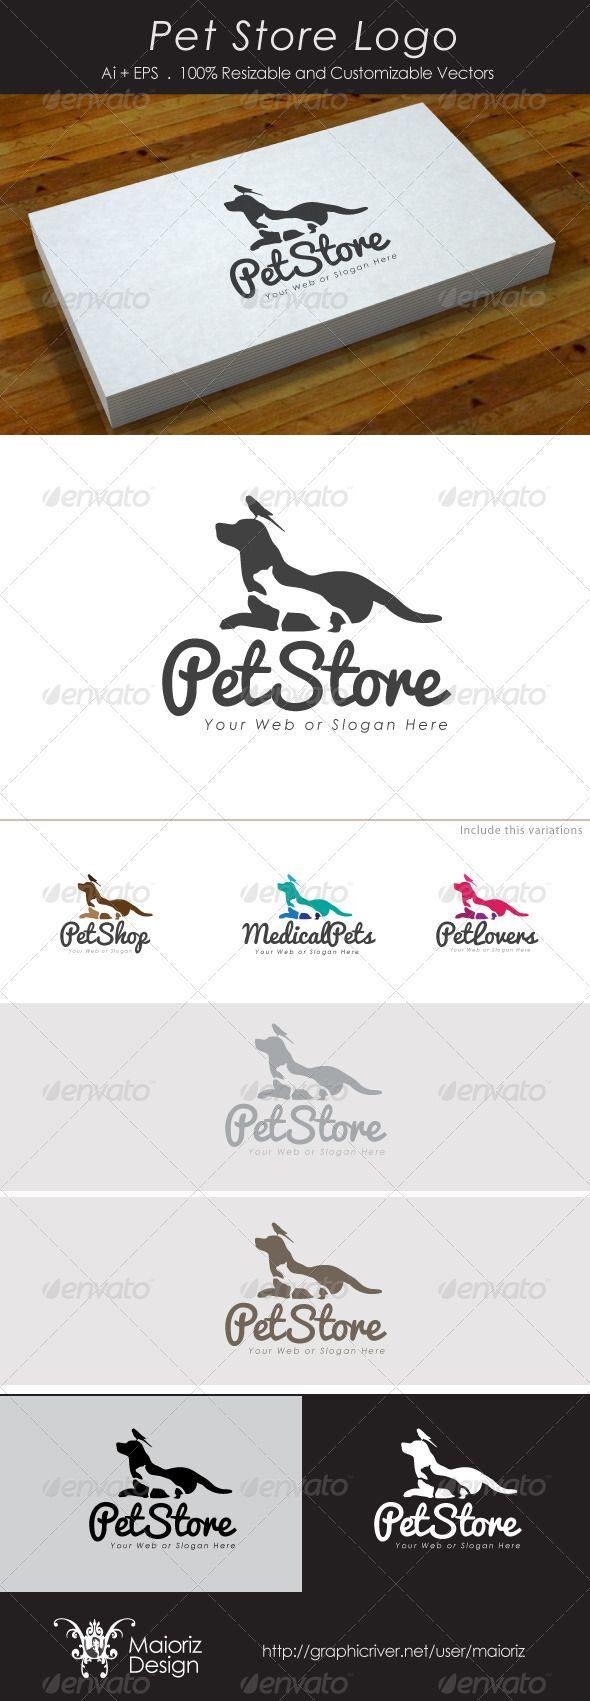 Pet Store Logo - GraphicRiver Item for Sale